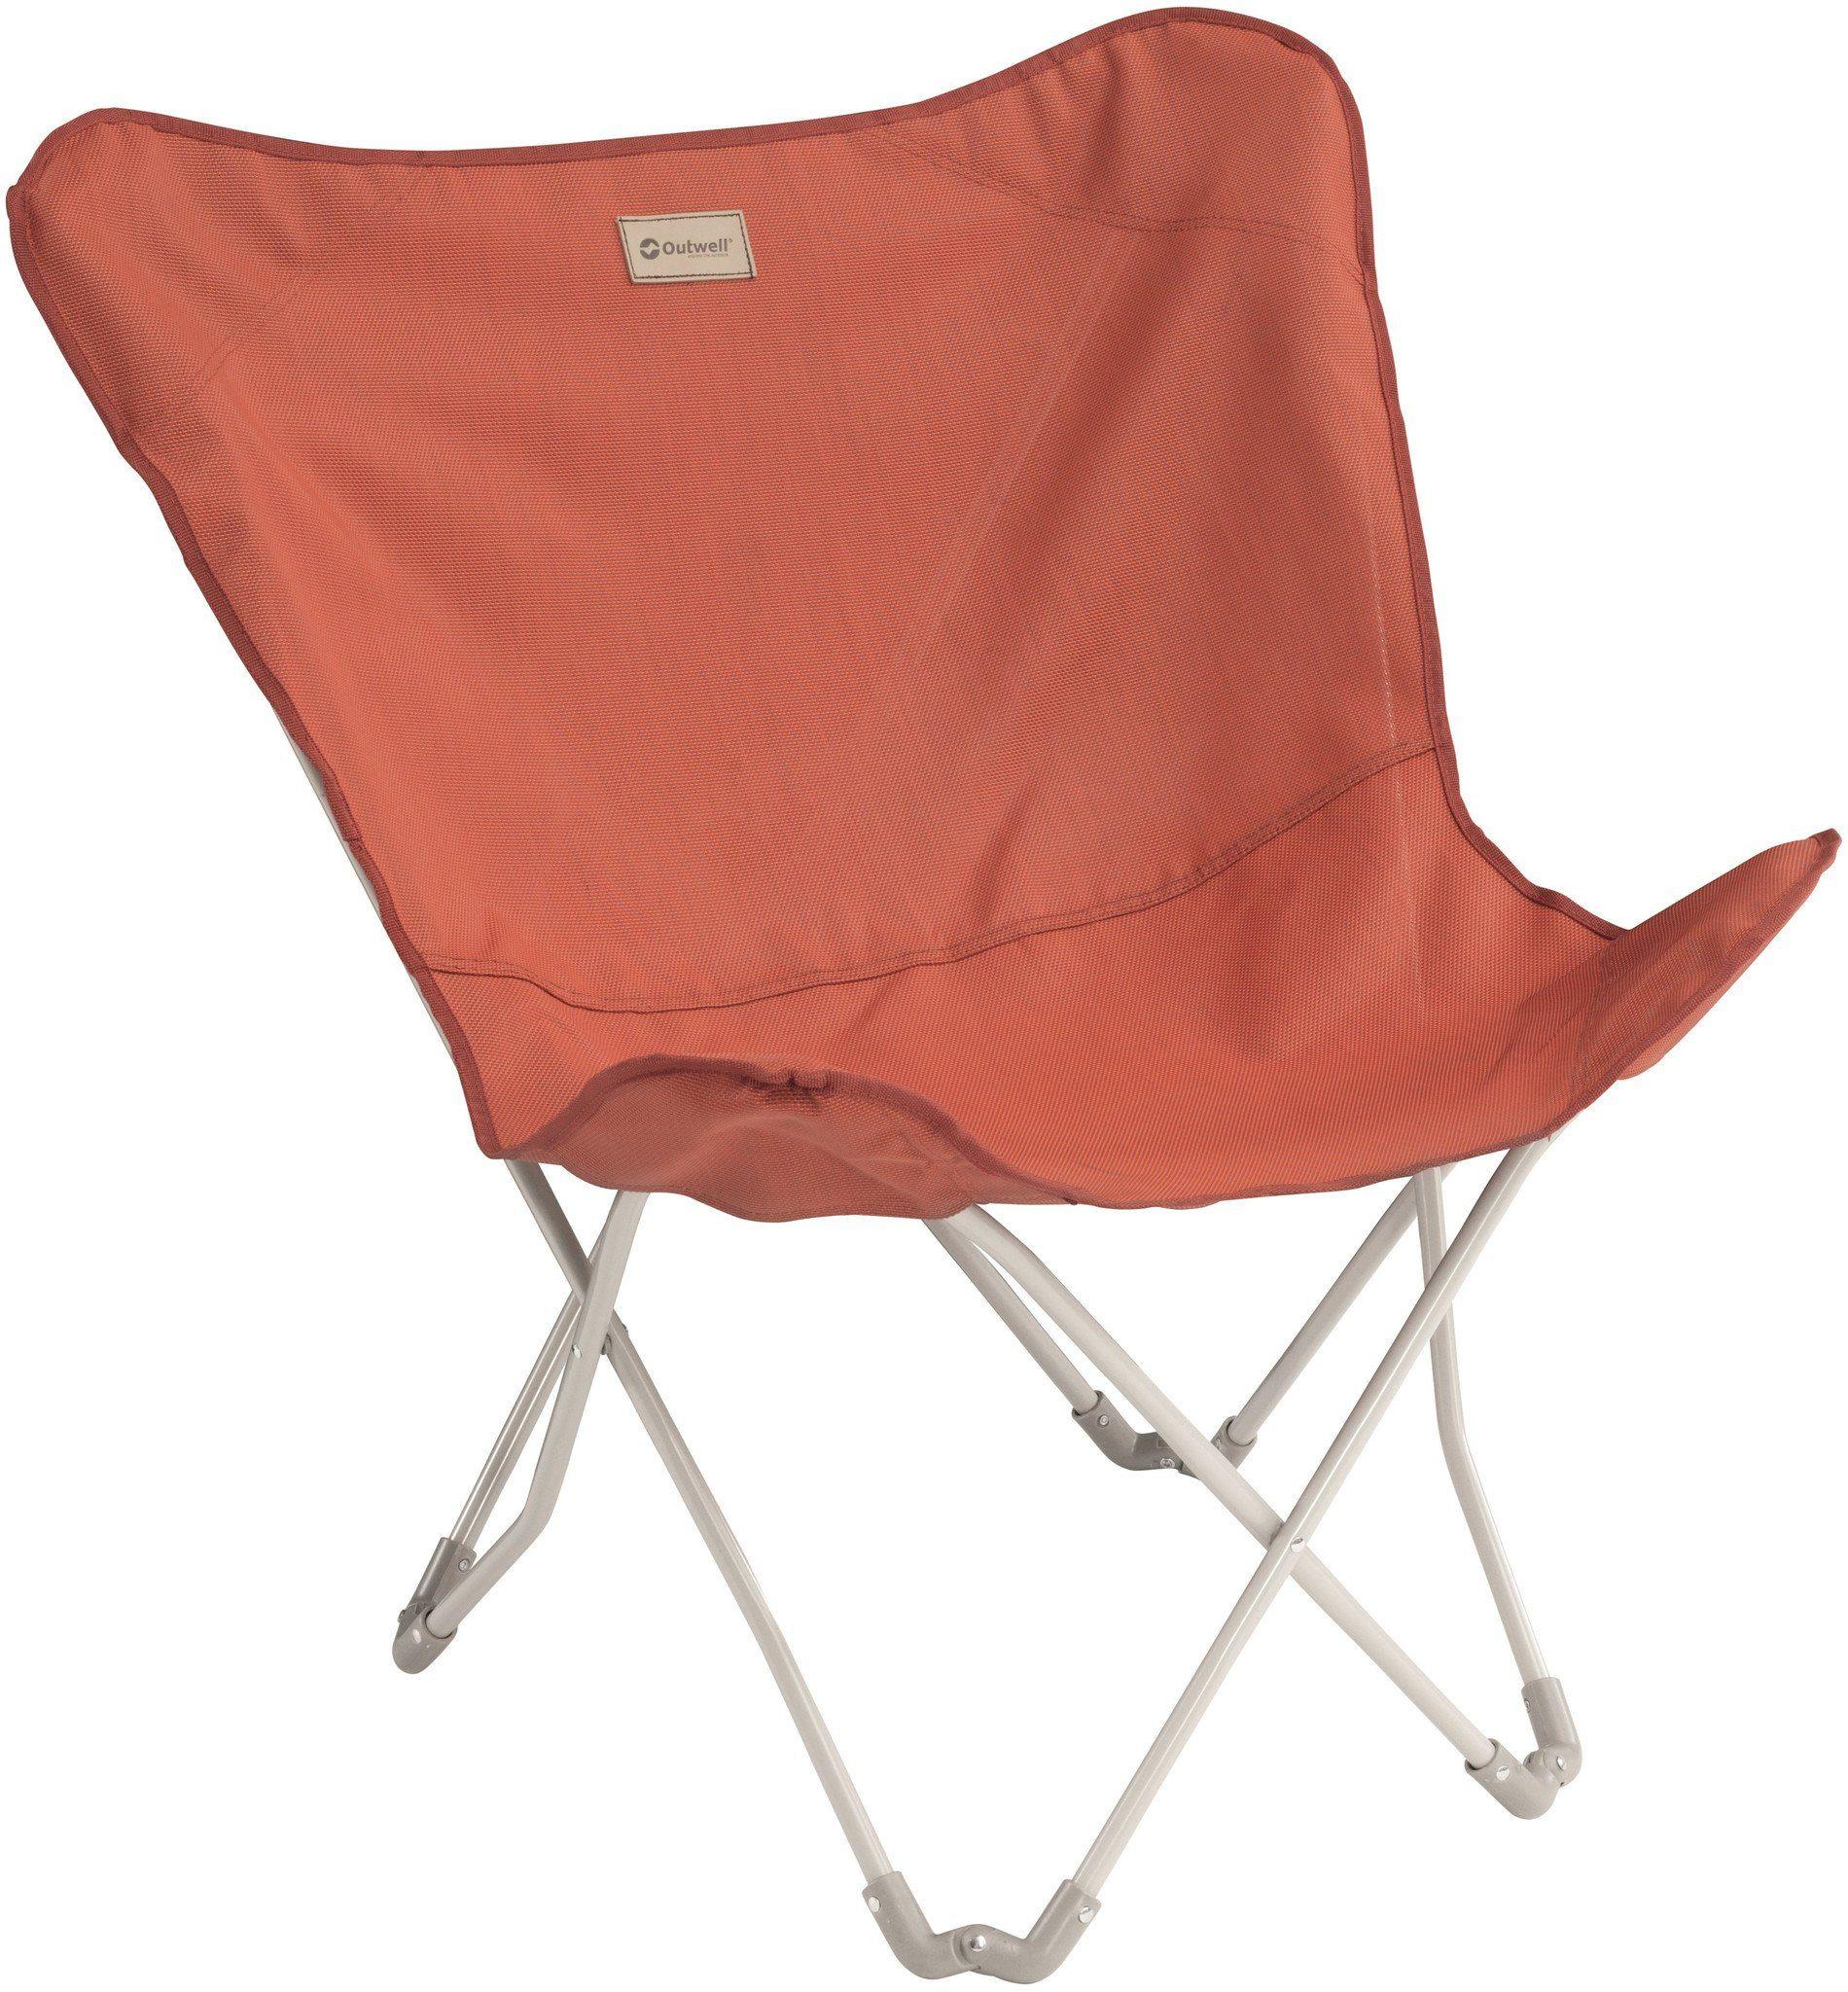 Outwell Campingstuhl Perce Chair Stuhl